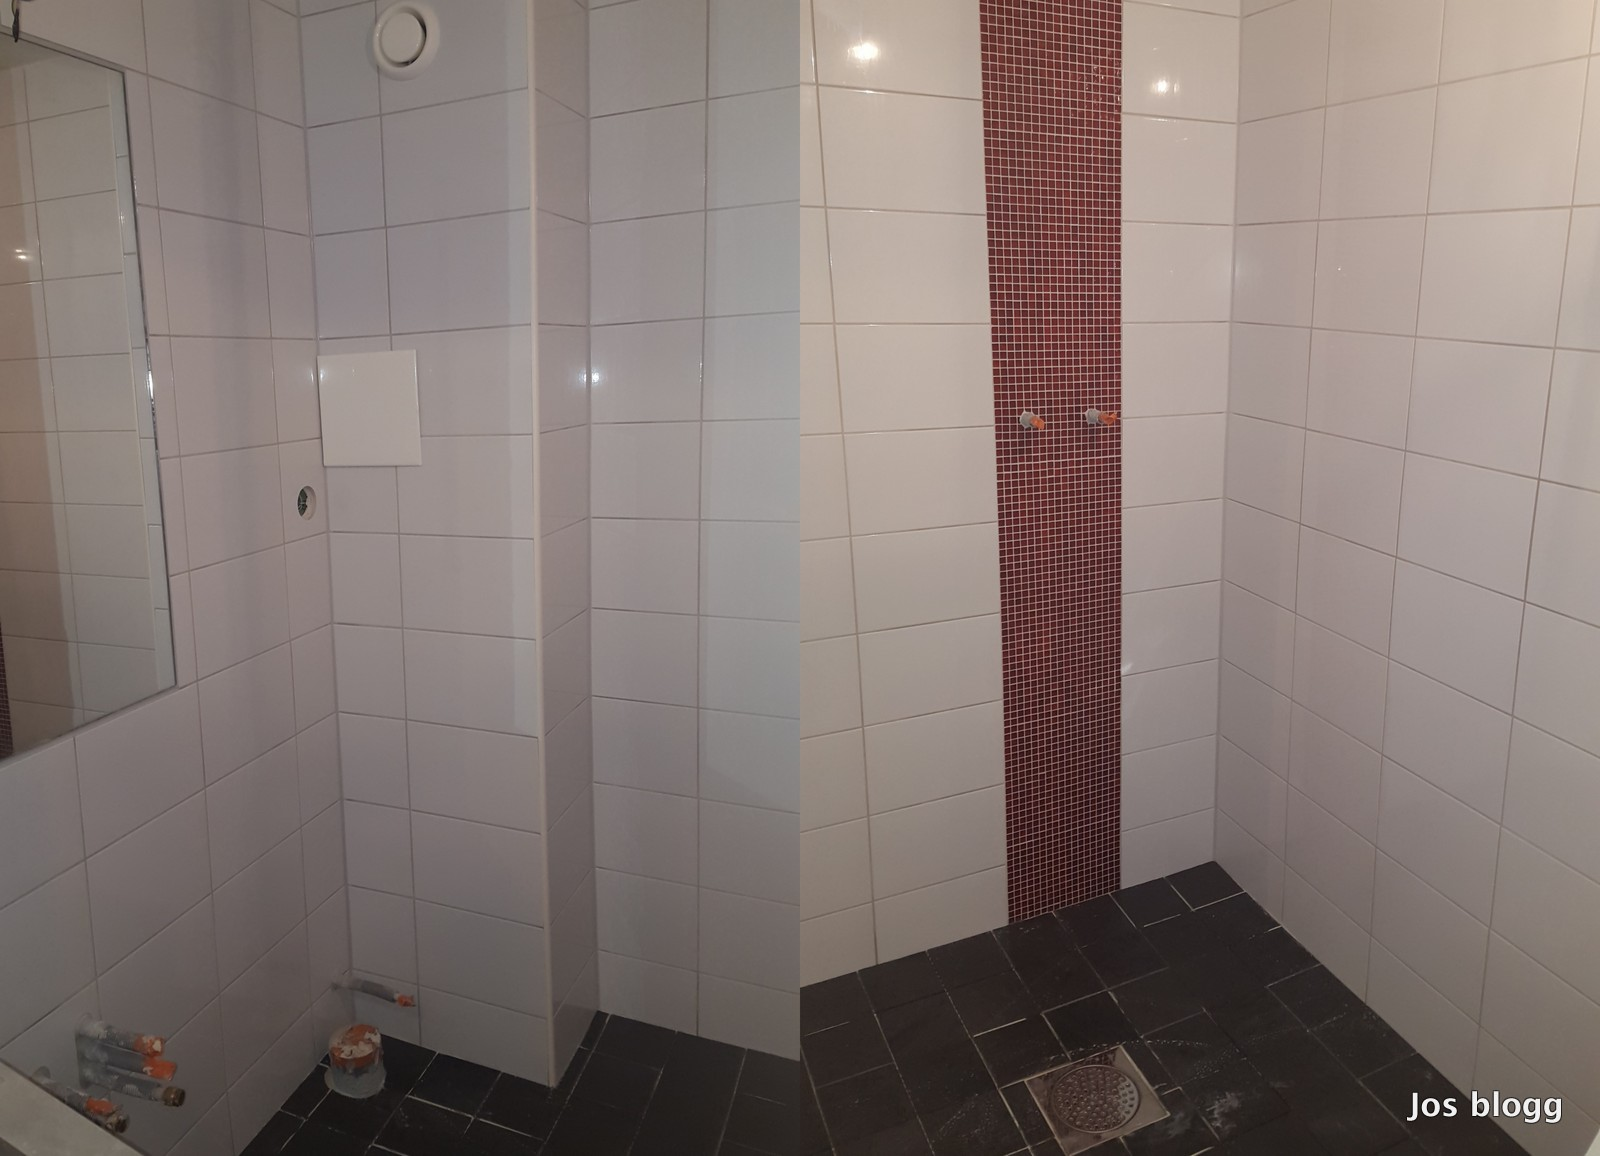 Jos blog » badrumsrenovering uppe